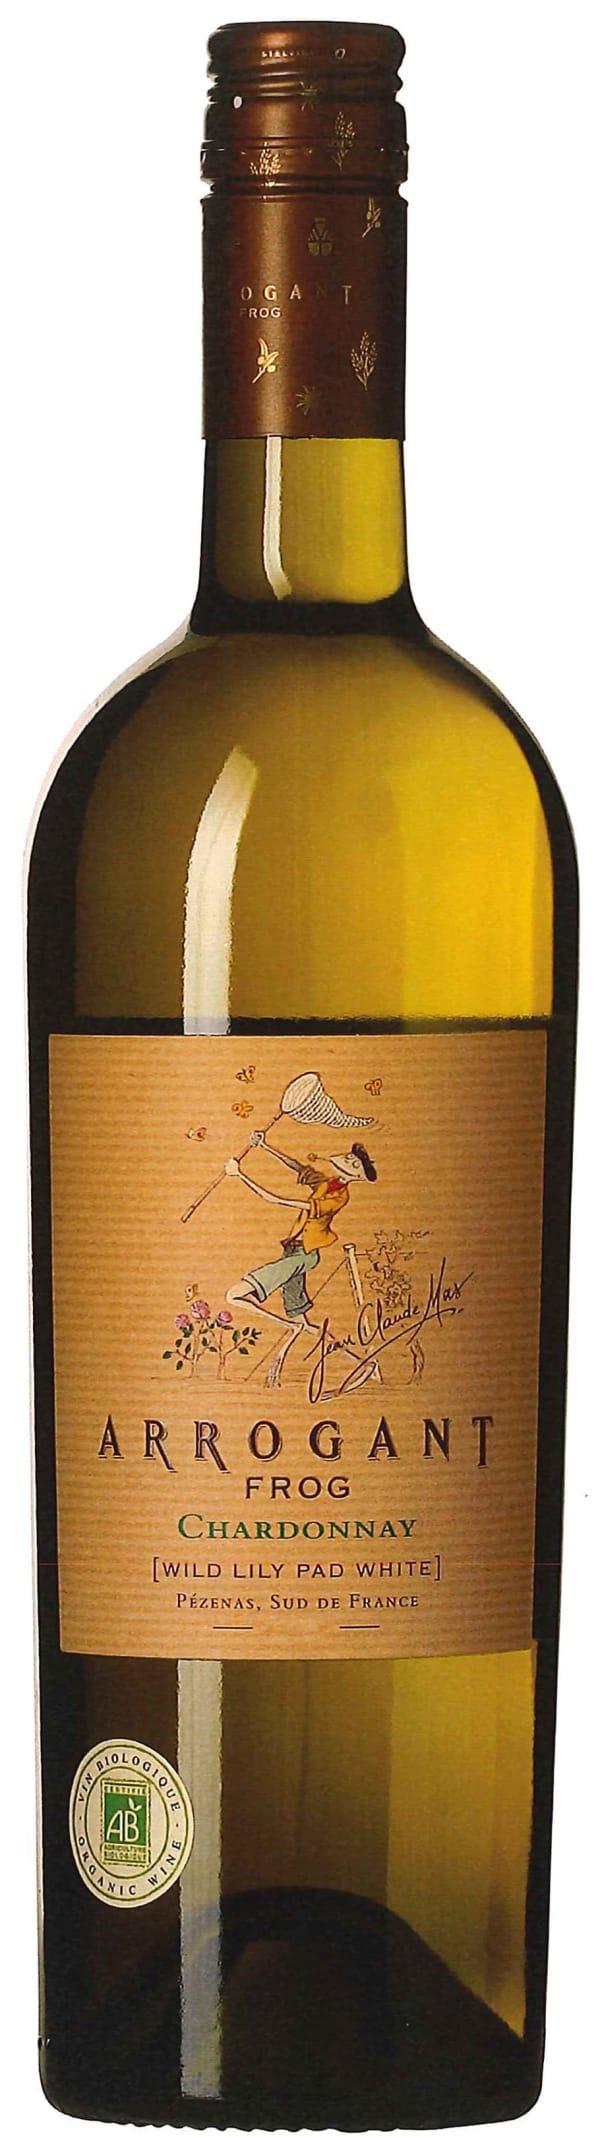 Arrogant Frog Chardonnay 2016